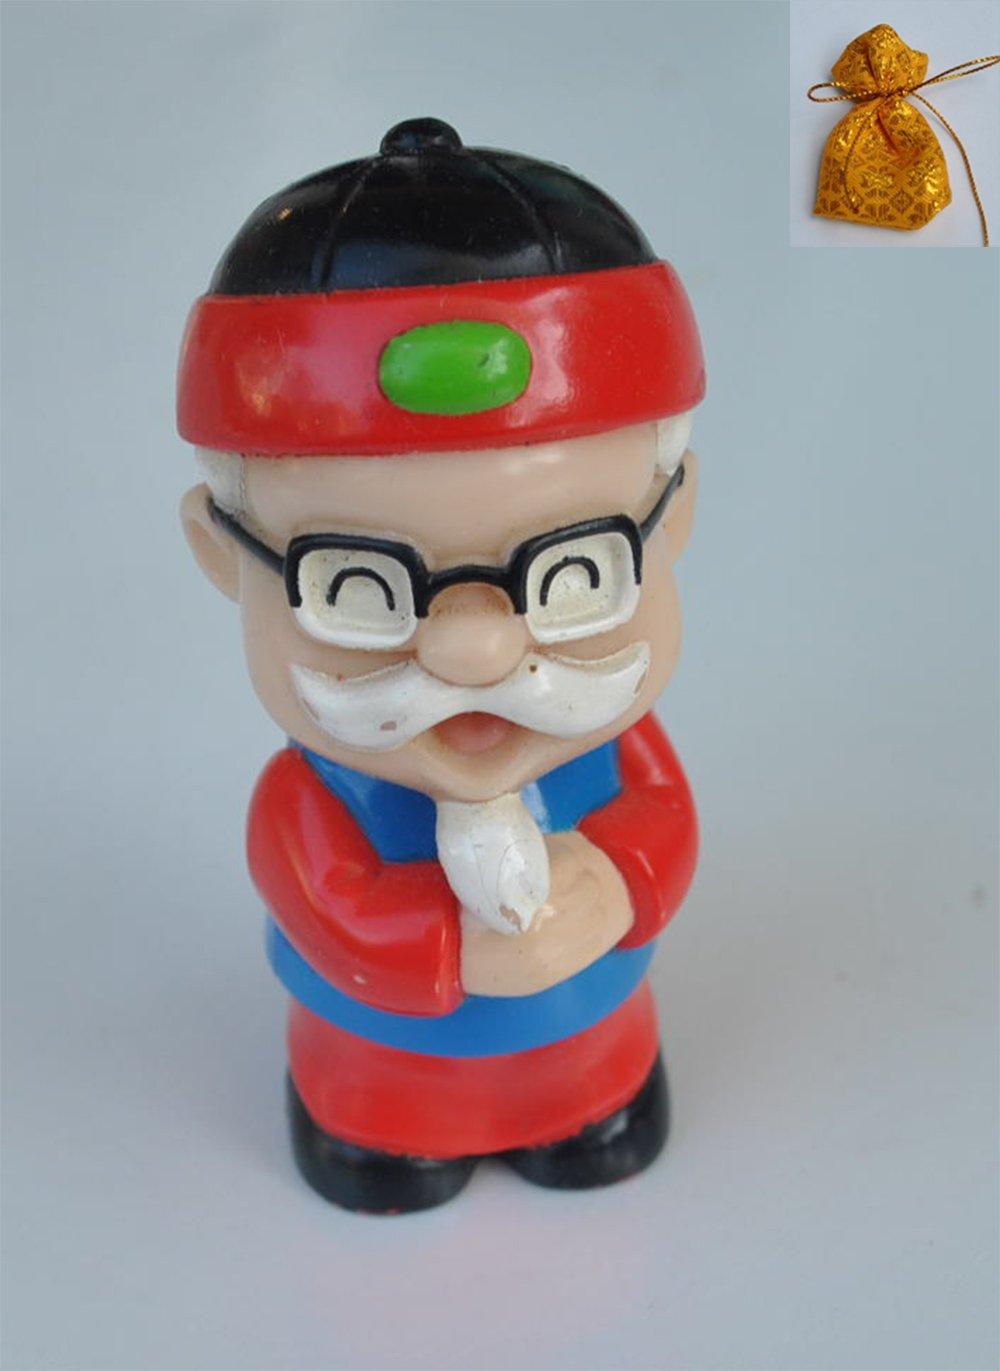 Amazon.com: KFC Kentucky Fried Chicken Toy Figures Colonel Sanders ...